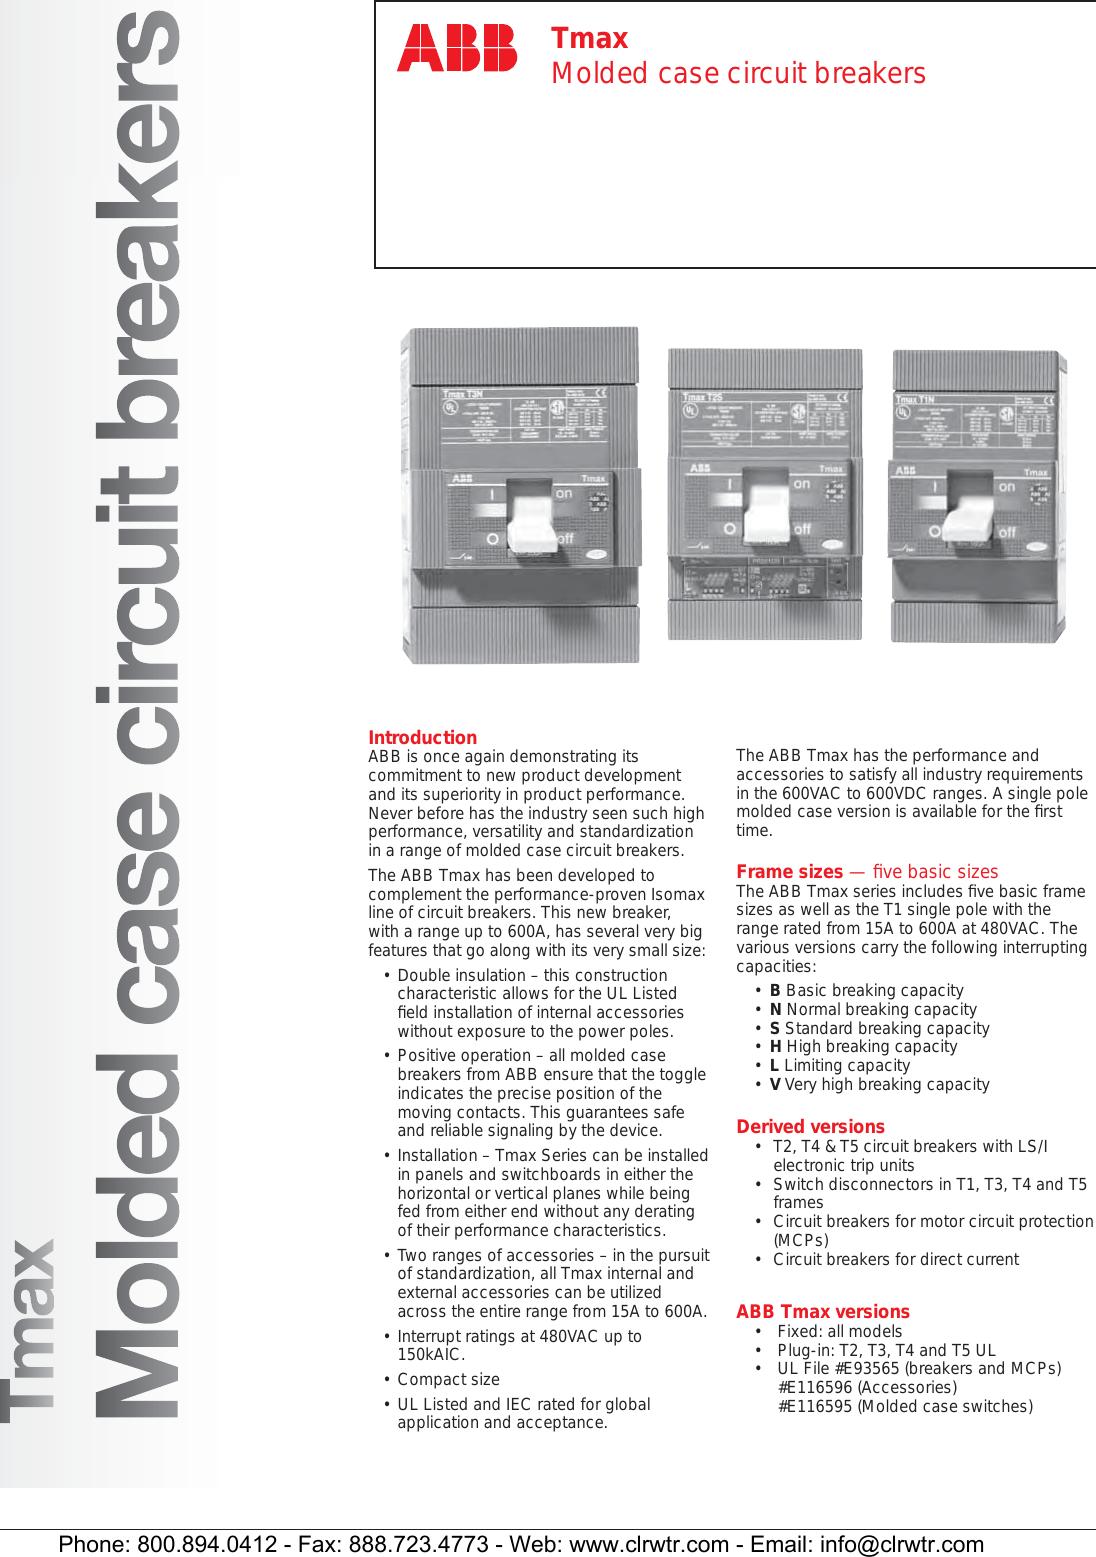 ABB Tmax Molded Case Circuit Breakers